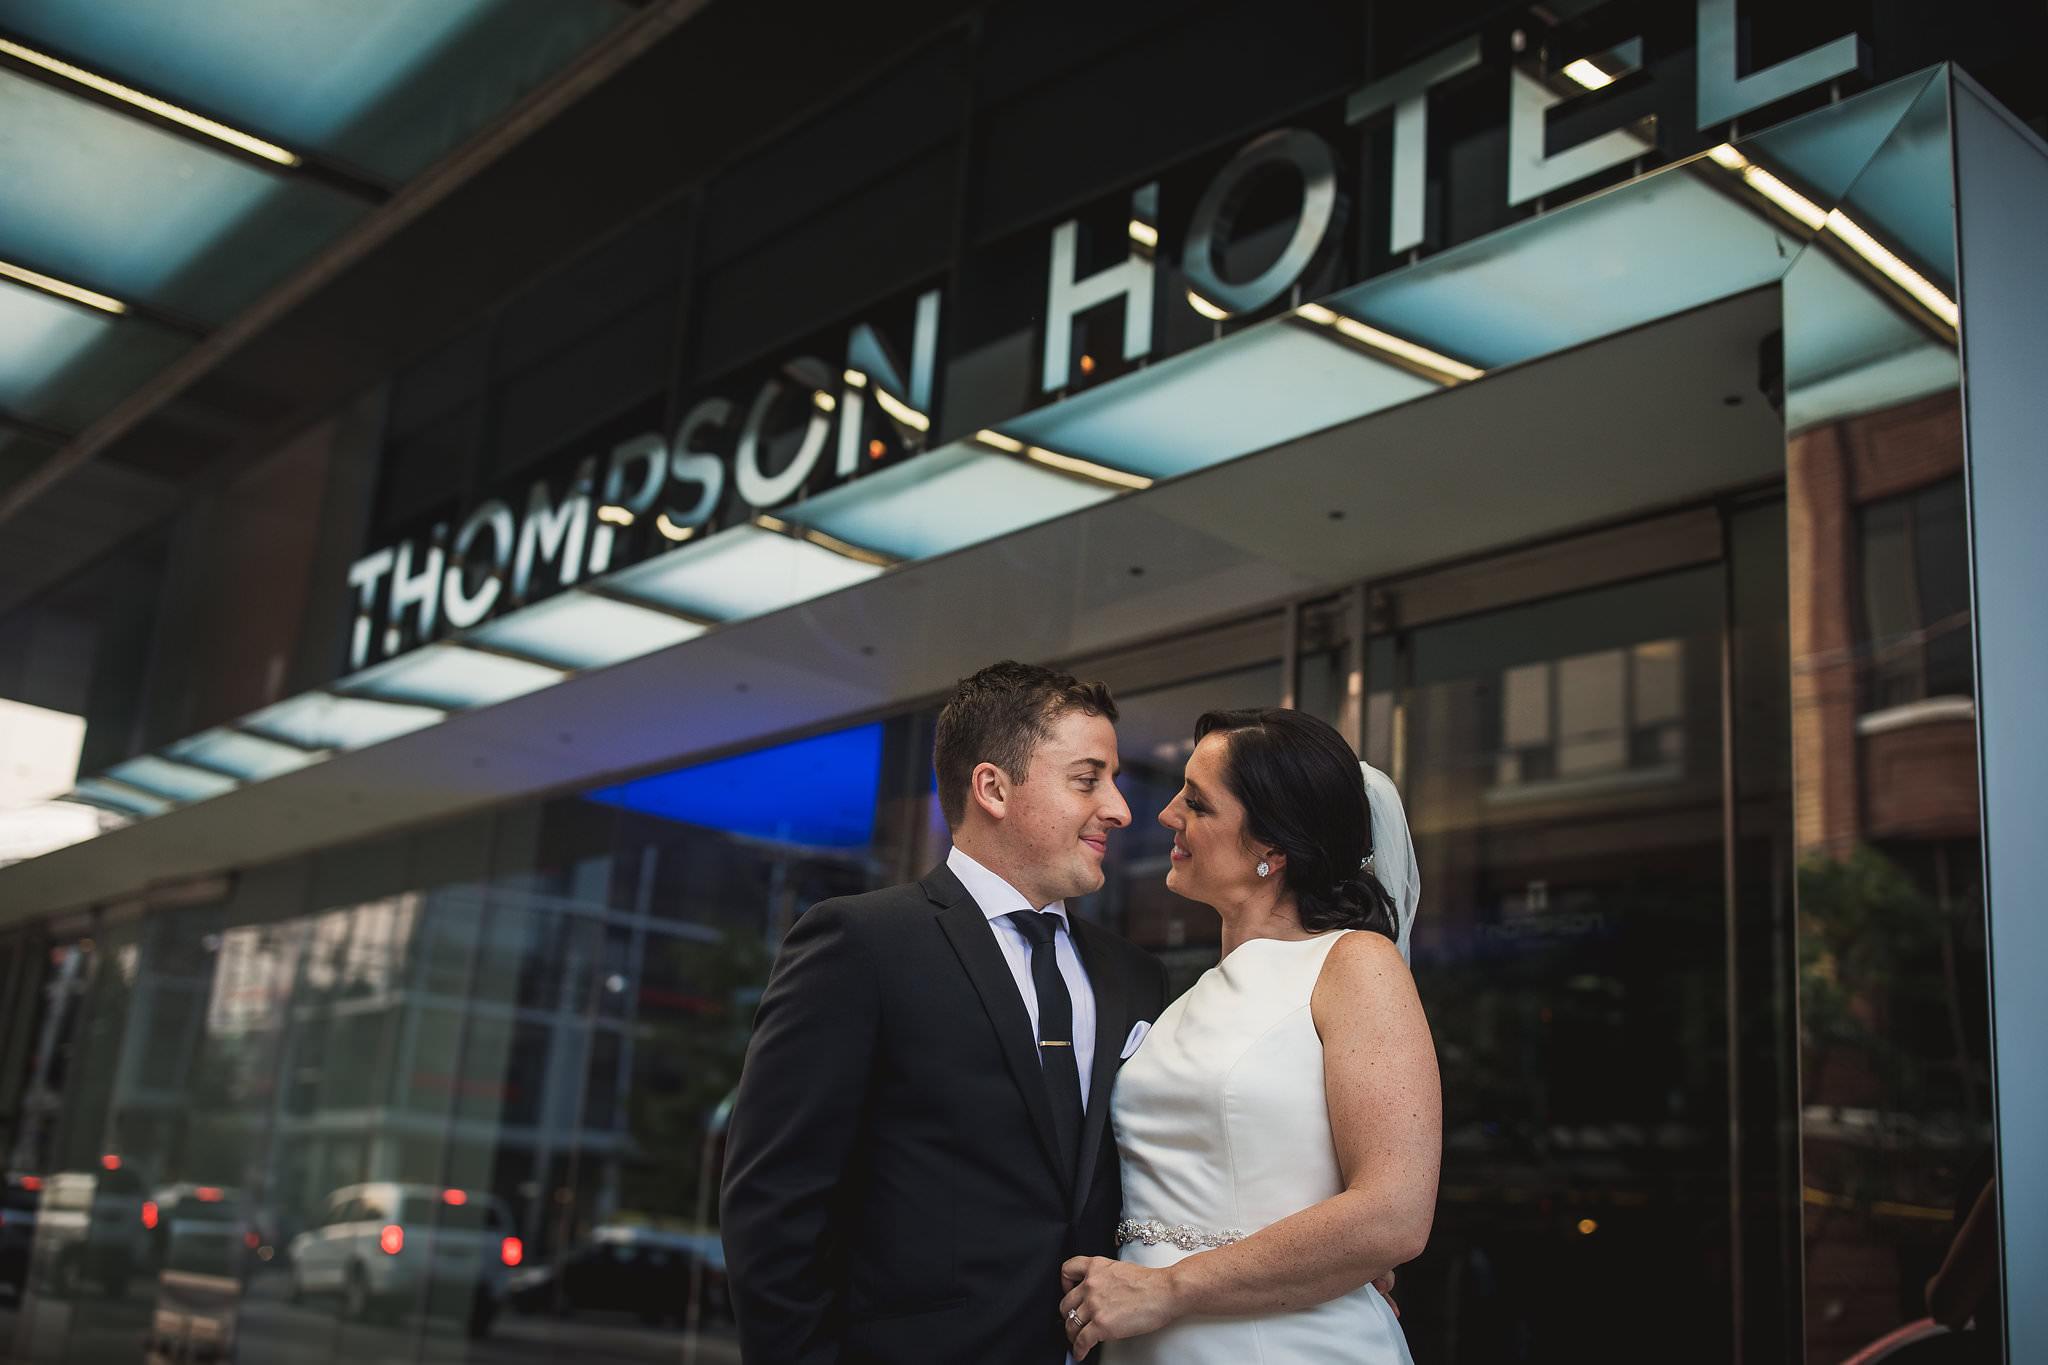 Cristin Rob Thompson Hotel Wedding Photos 603 - Thompson Hotel Wedding Photos